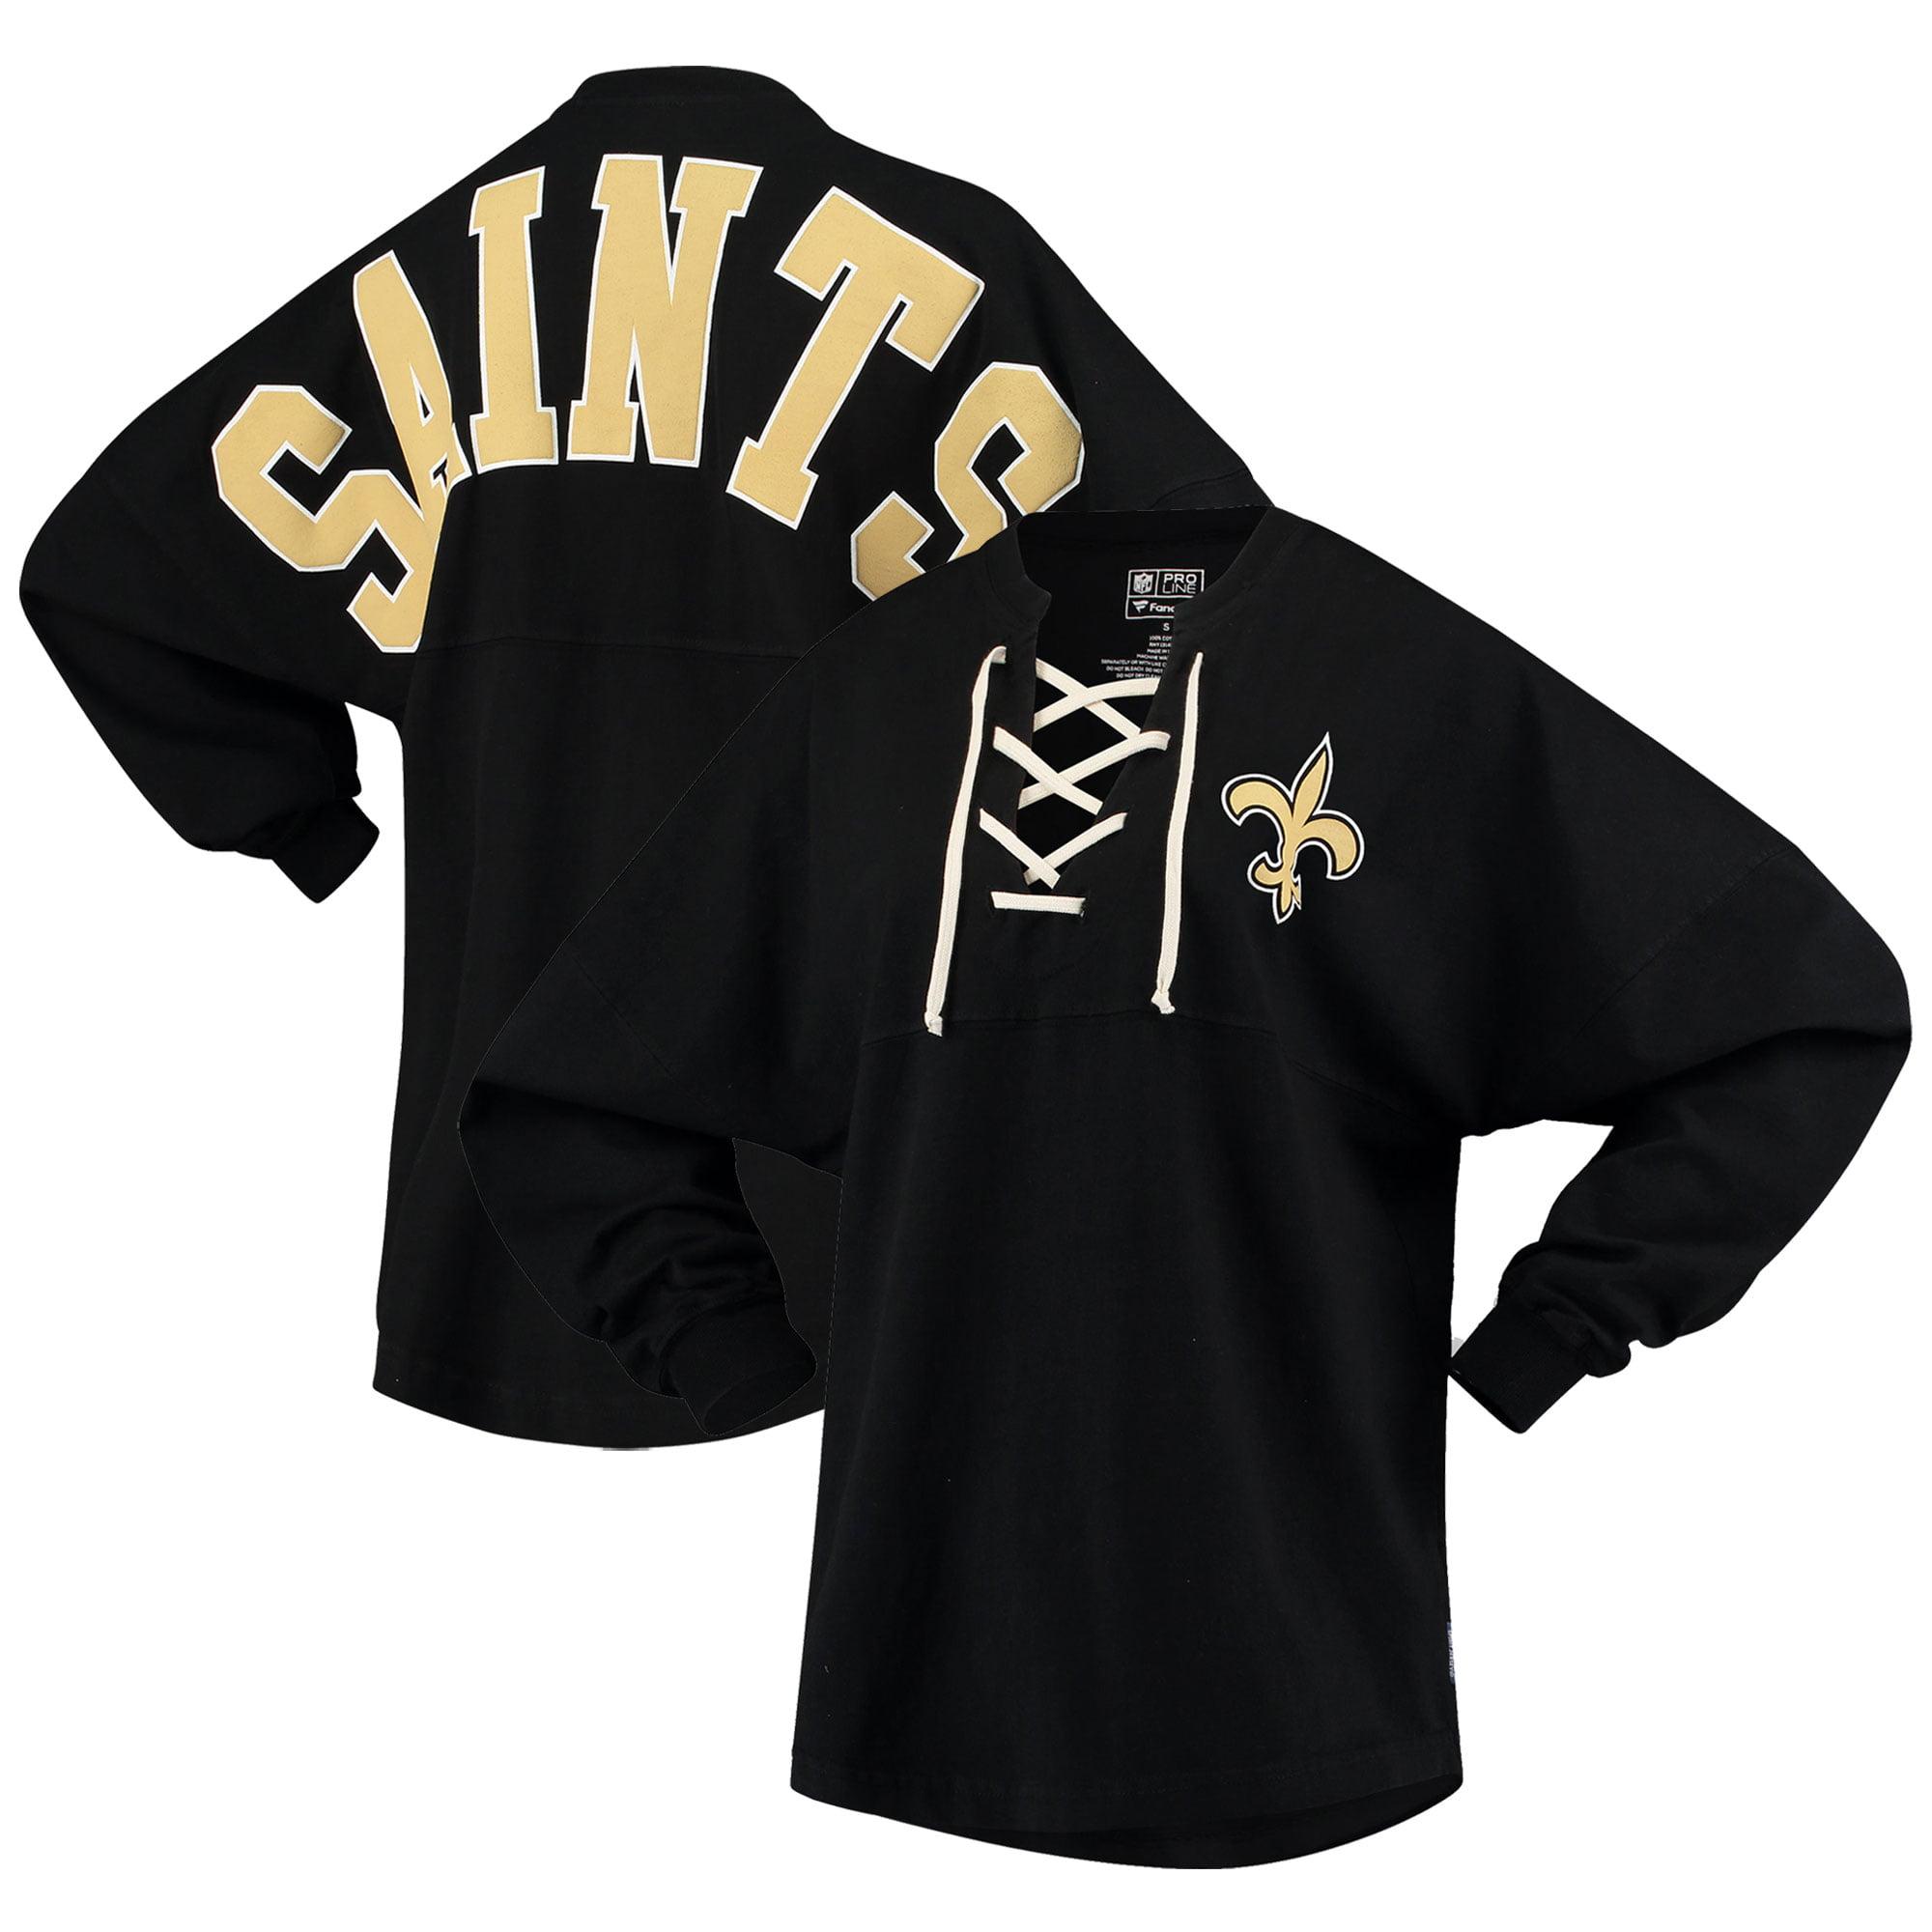 New Orleans Saints NFL Pro Line by Fanatics Branded Women's Spirit Jersey Long Sleeve Lace Up T-Shirt - Black